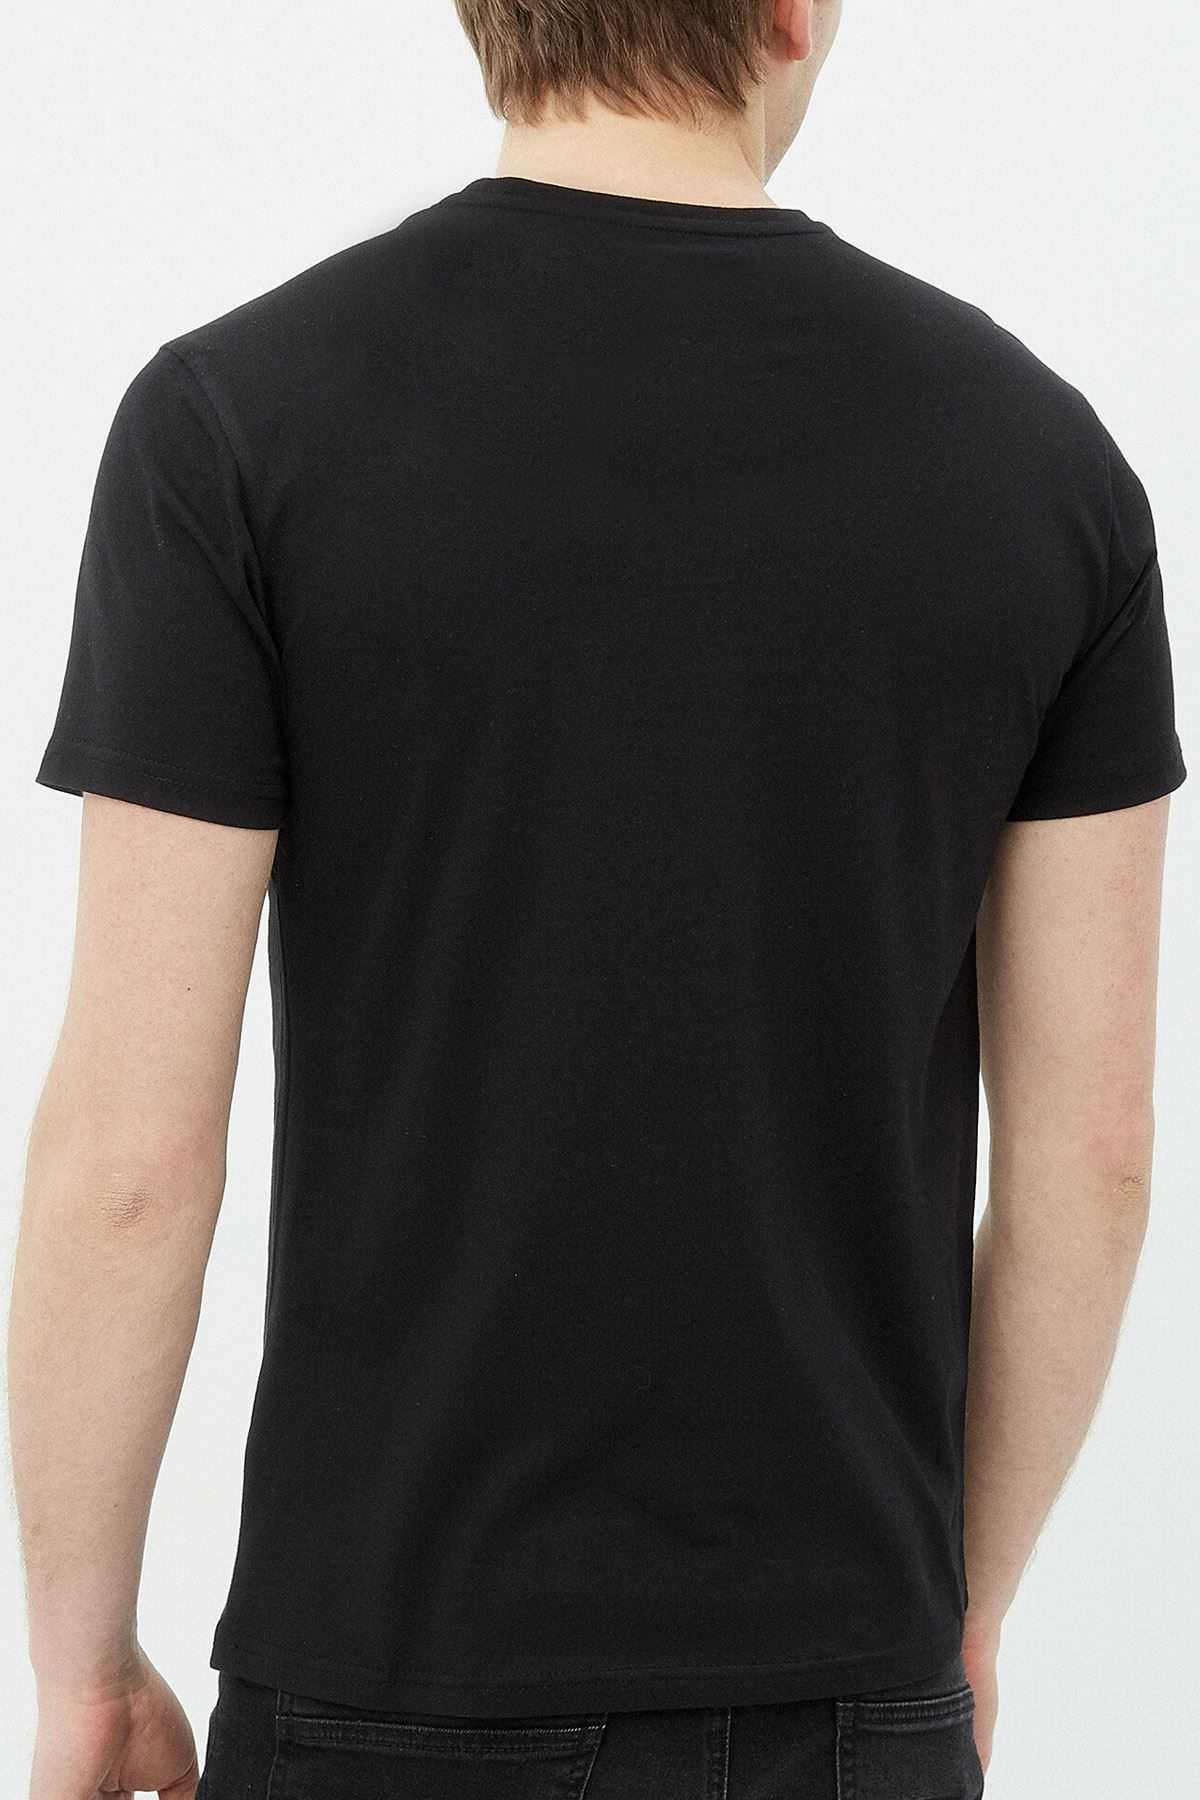 Anime Monkey Siyah Erkek Tshirt - Tişört